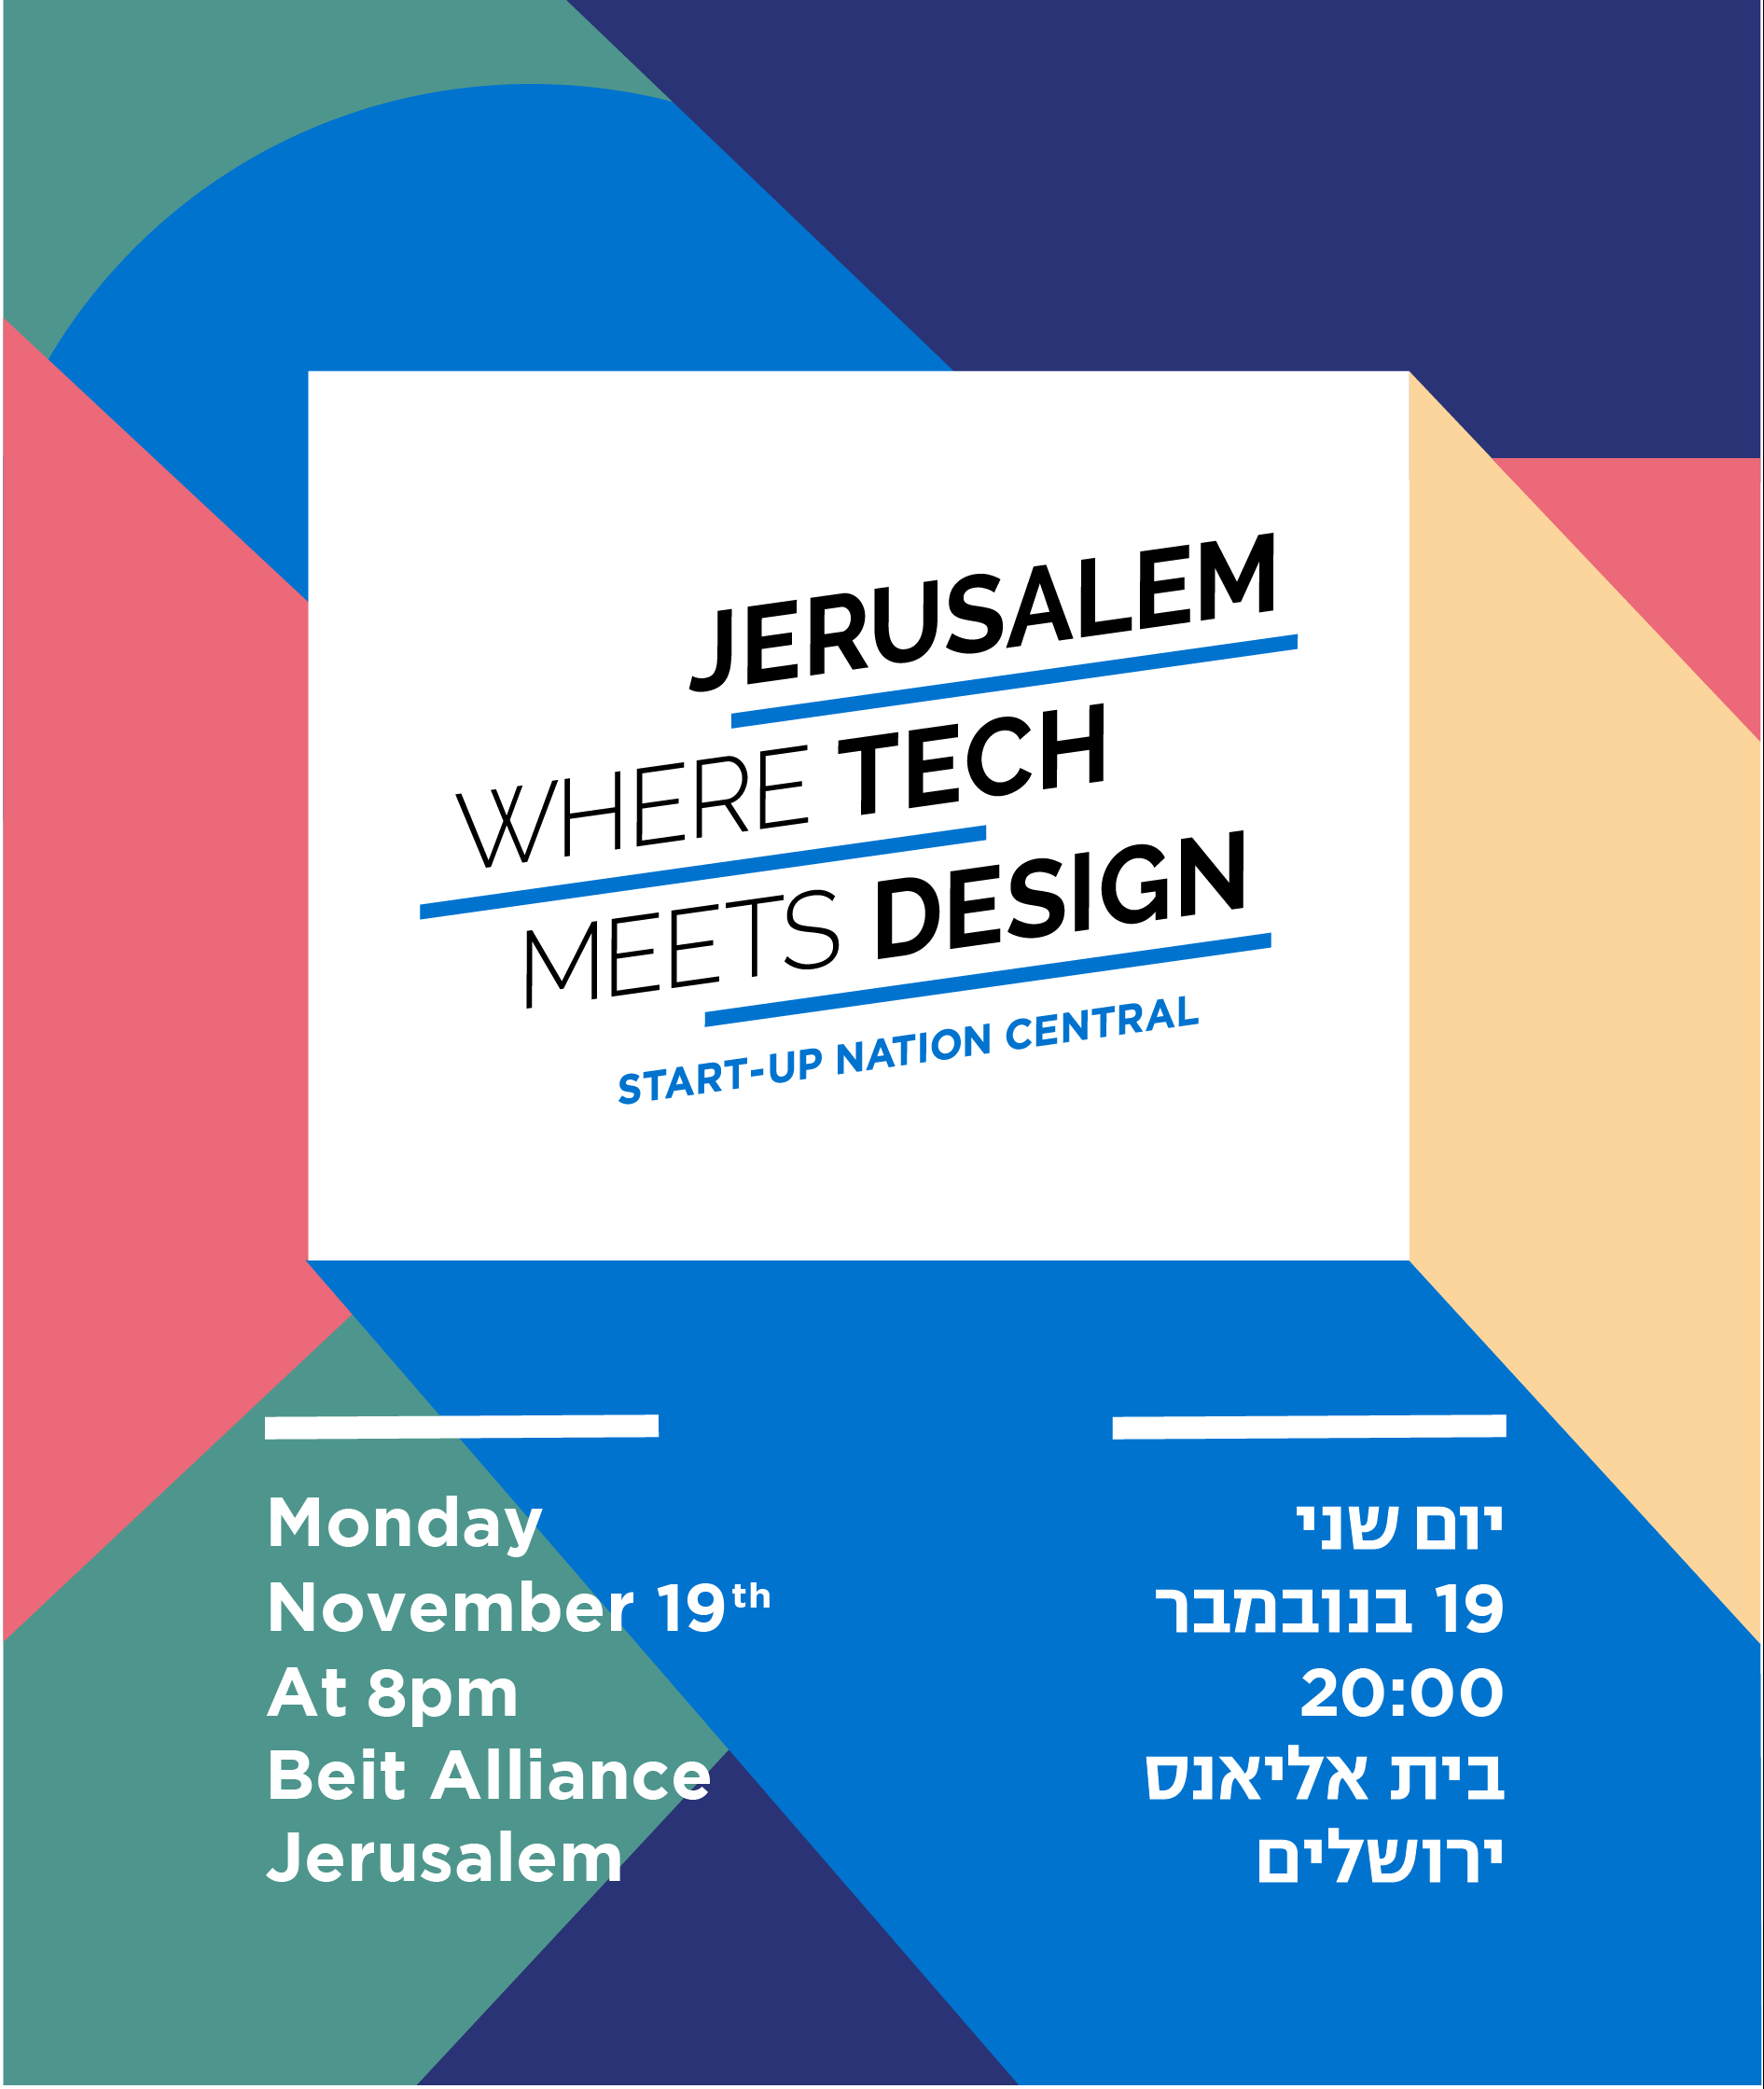 Jerusalem Where Tech Meets Design Invitation